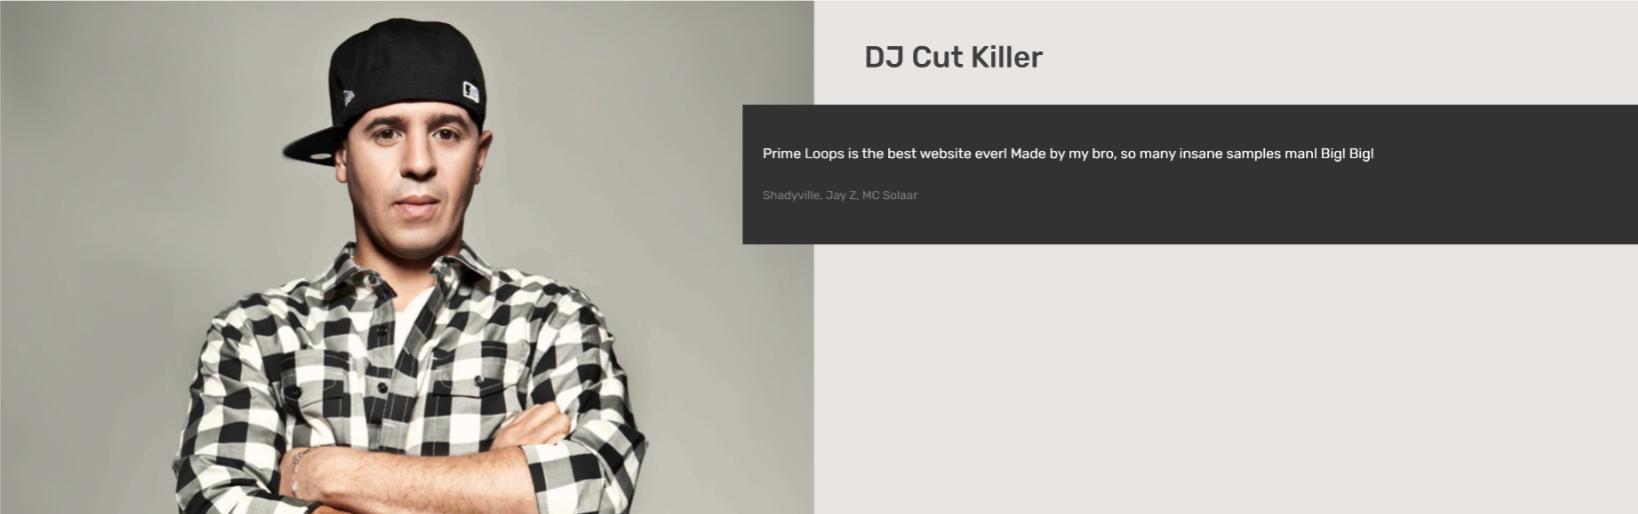 DJ Cut Killer   Testimonial